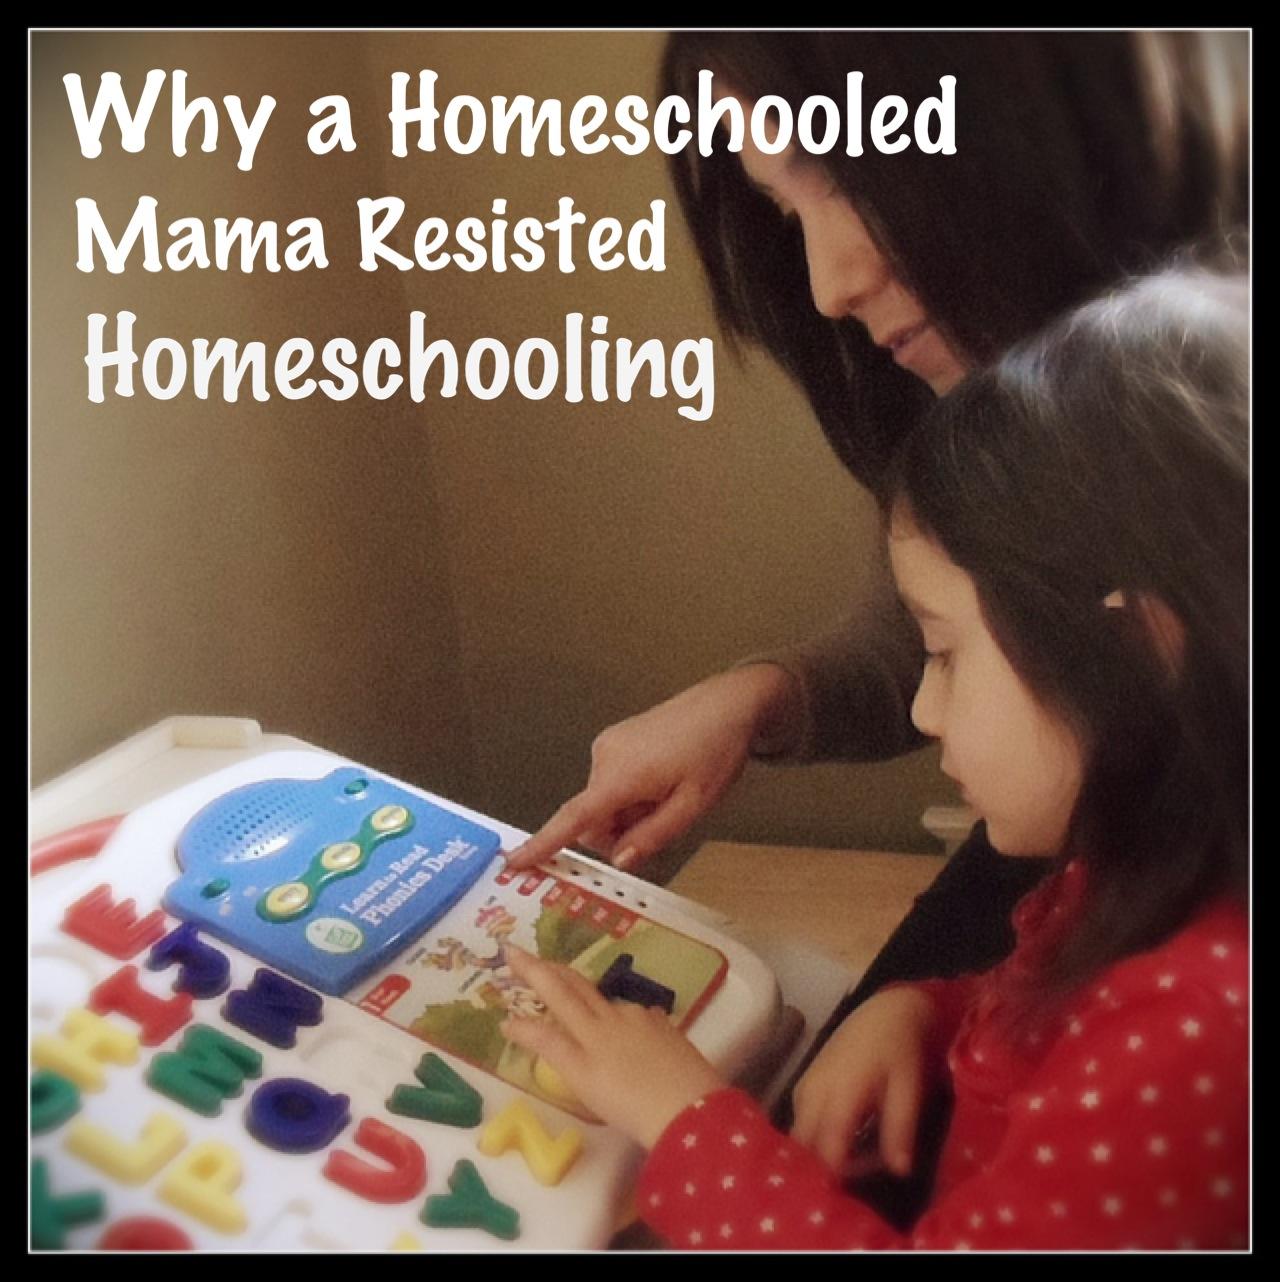 Why a Homeschooled Mama Resisted Homeschooling www.HomeschoolinMama.com @HomeschoolnMama